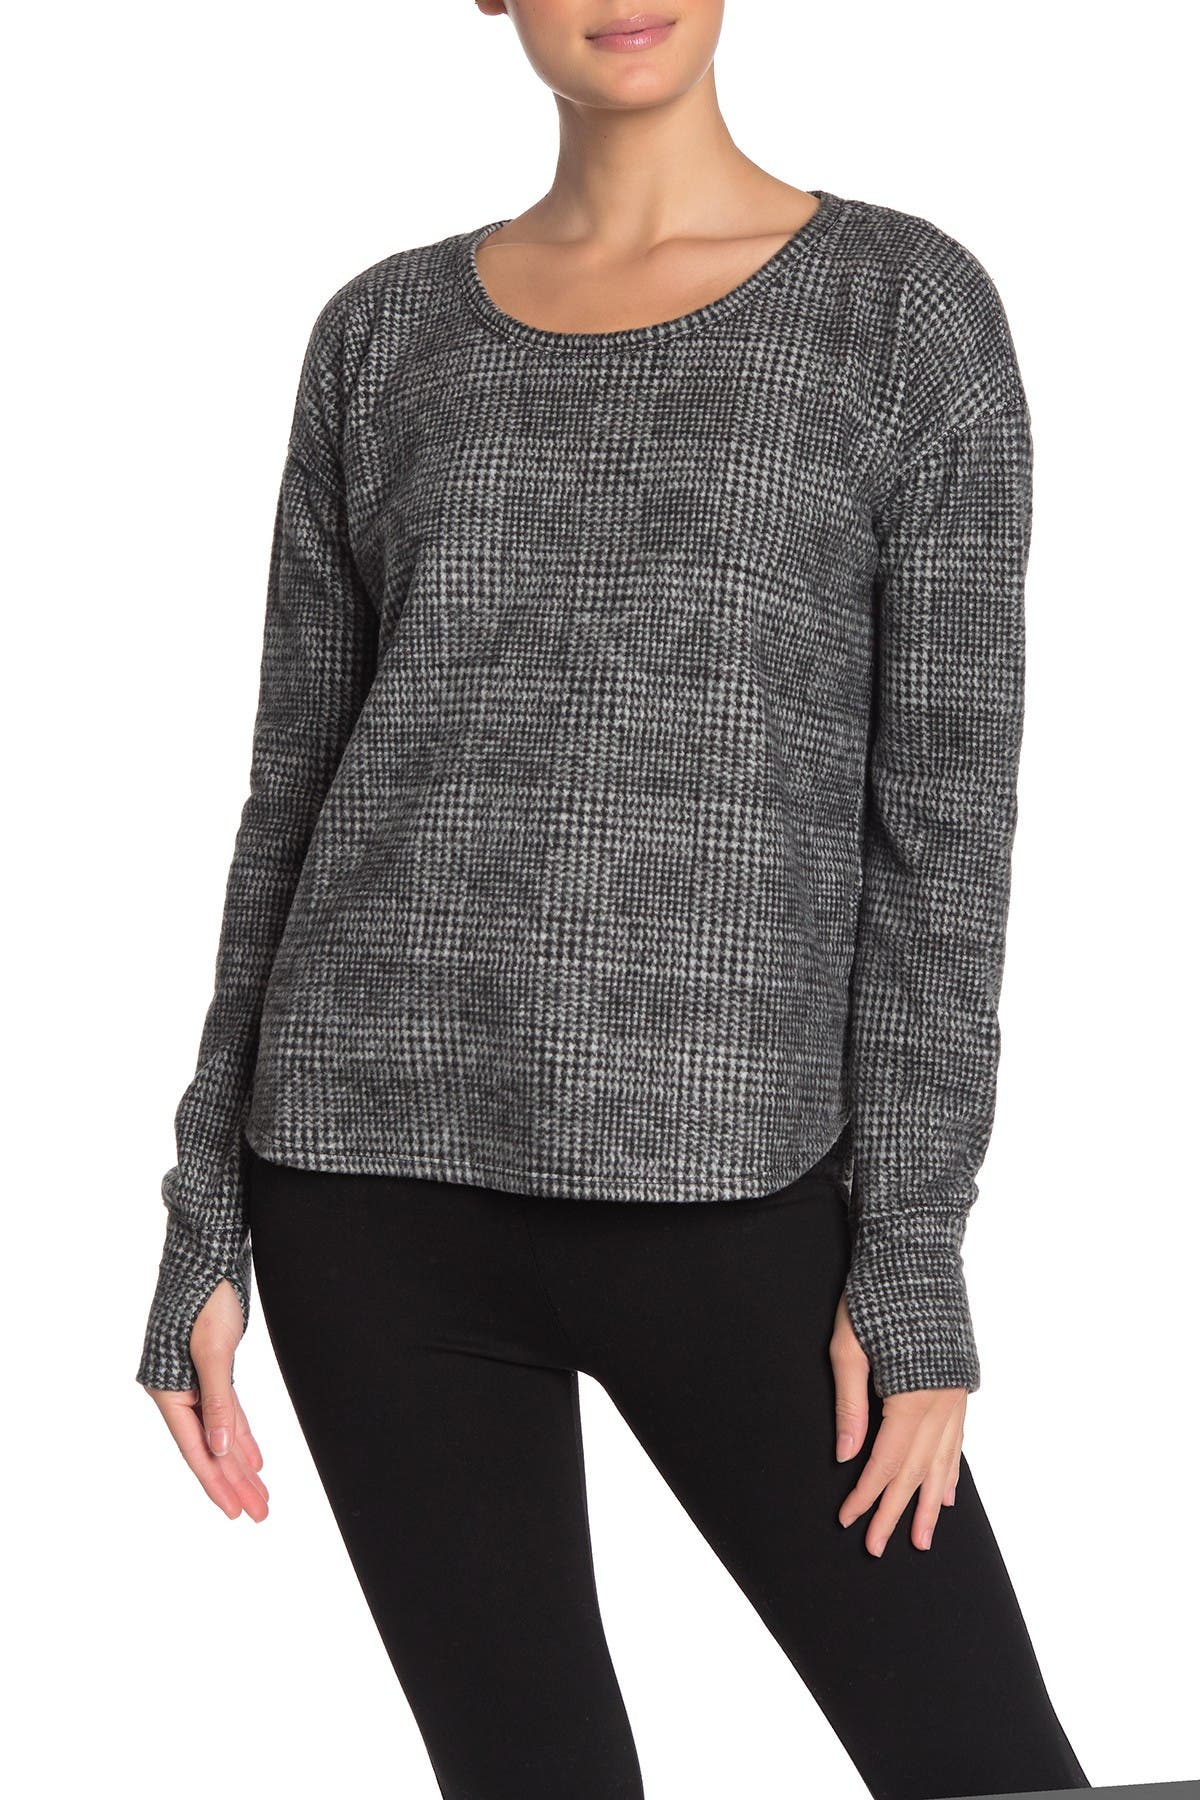 Image of CG Sport Cozy Glen Plaid Print Thumbhole Sweater